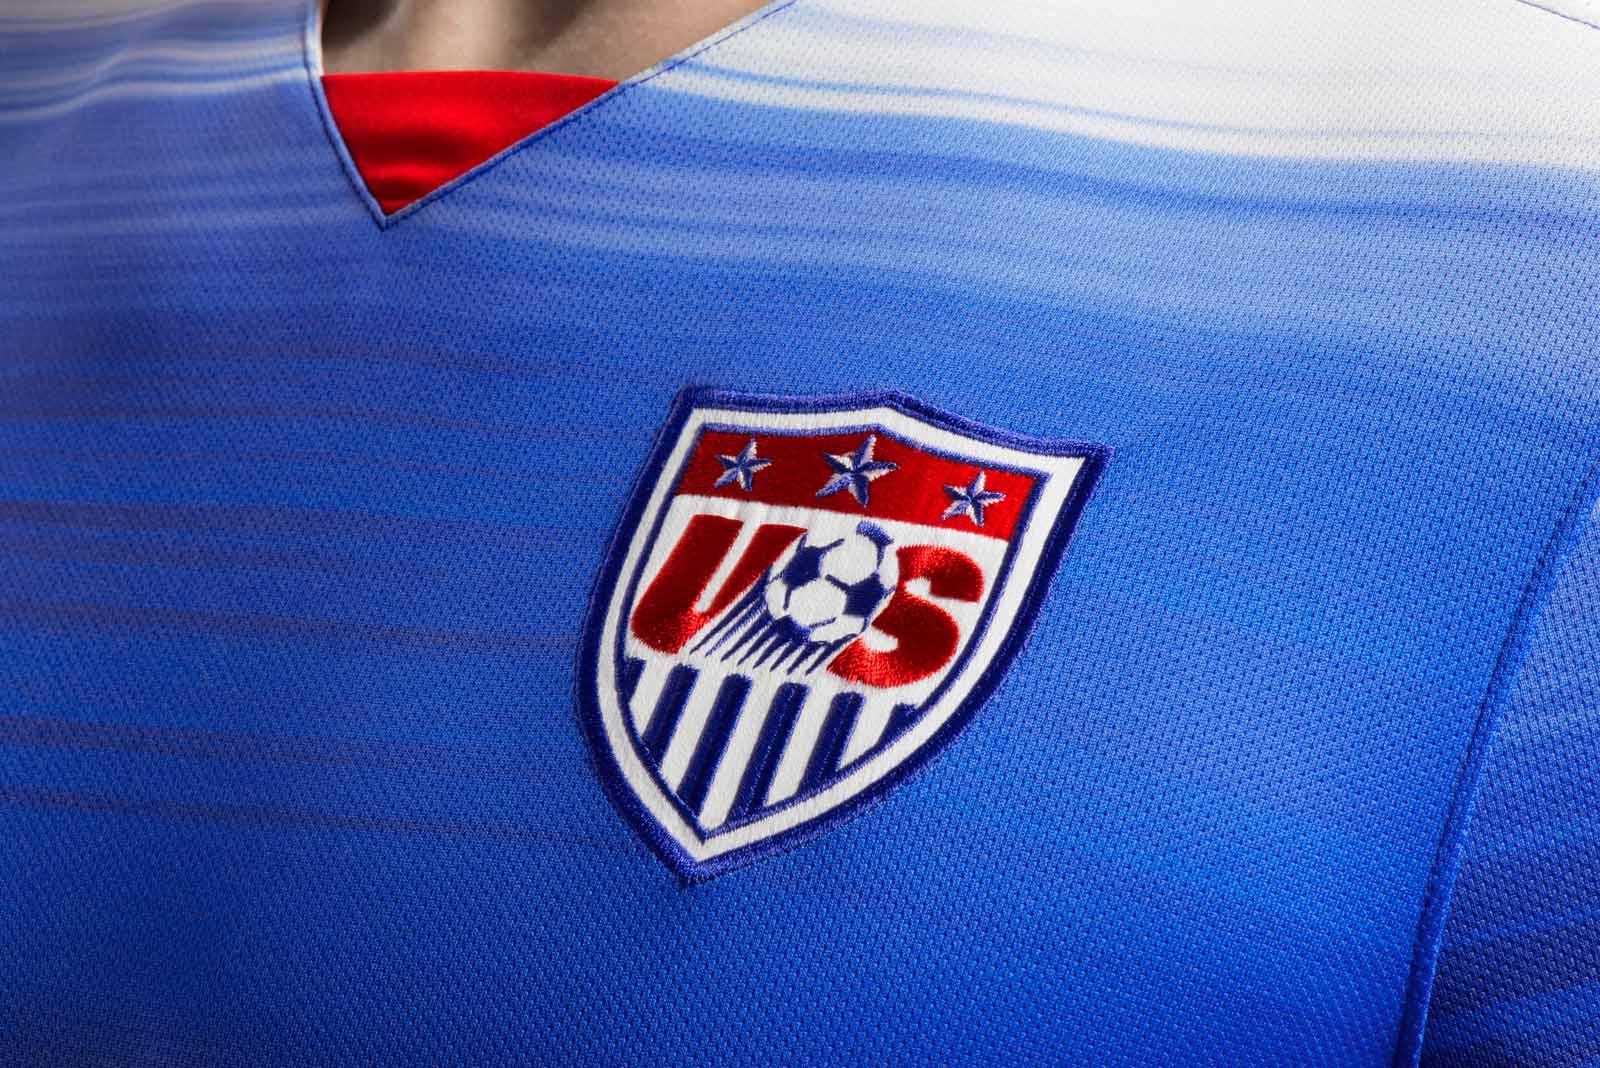 Nike USA 2015 Away Kit Released - Footy Headlines